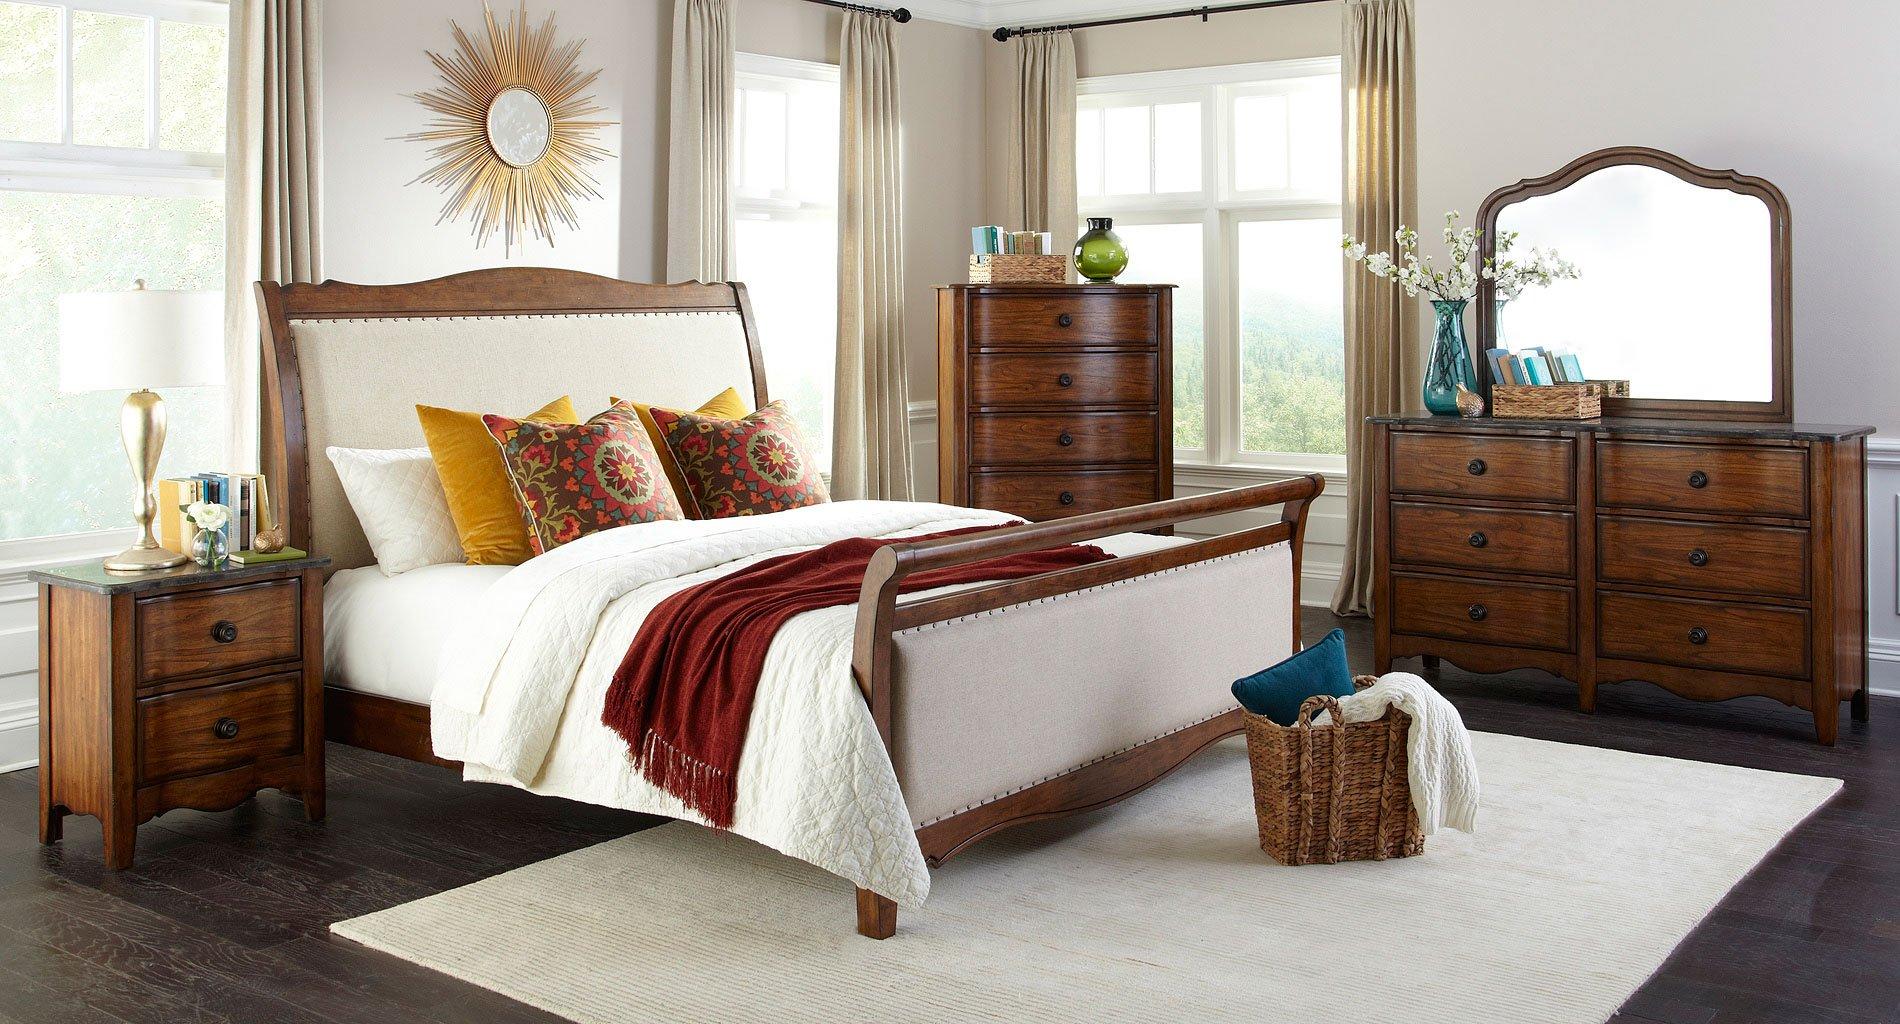 Luciano upholstered sleigh bedroom set intercon furniture furniture cart for Upholstered sleigh bedroom set